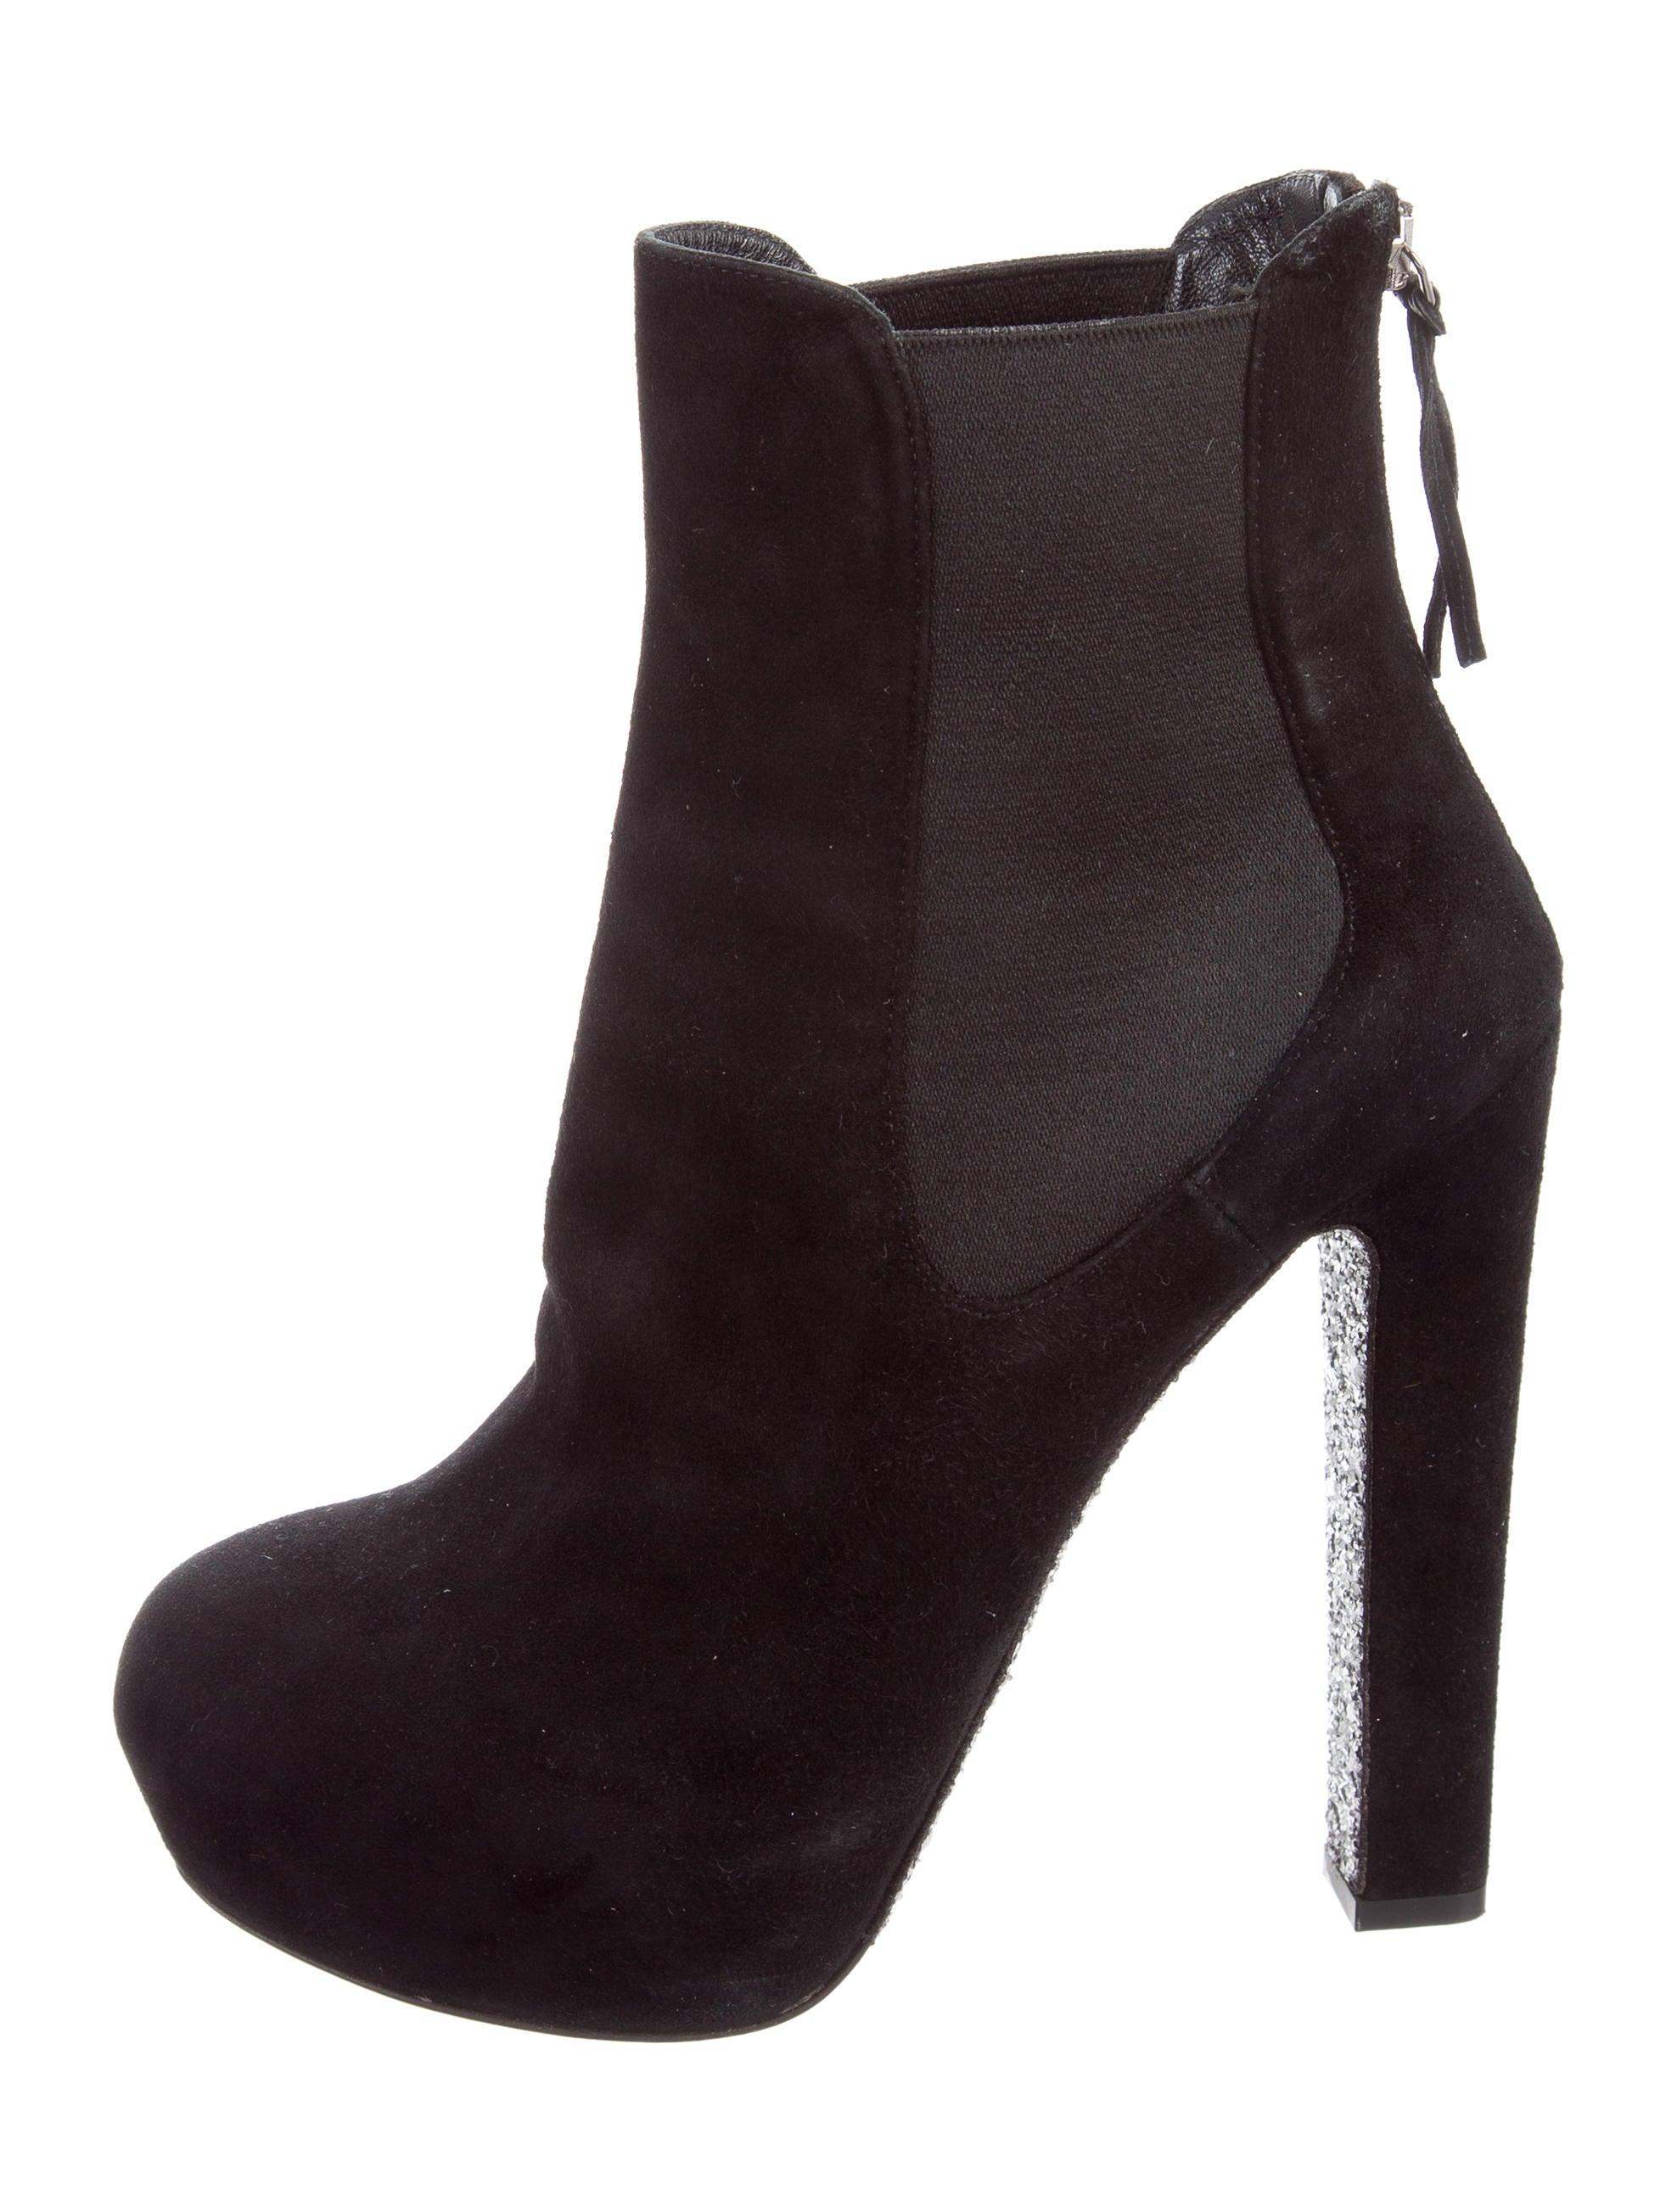 miu miu suede platform ankle boots shoes miu54661